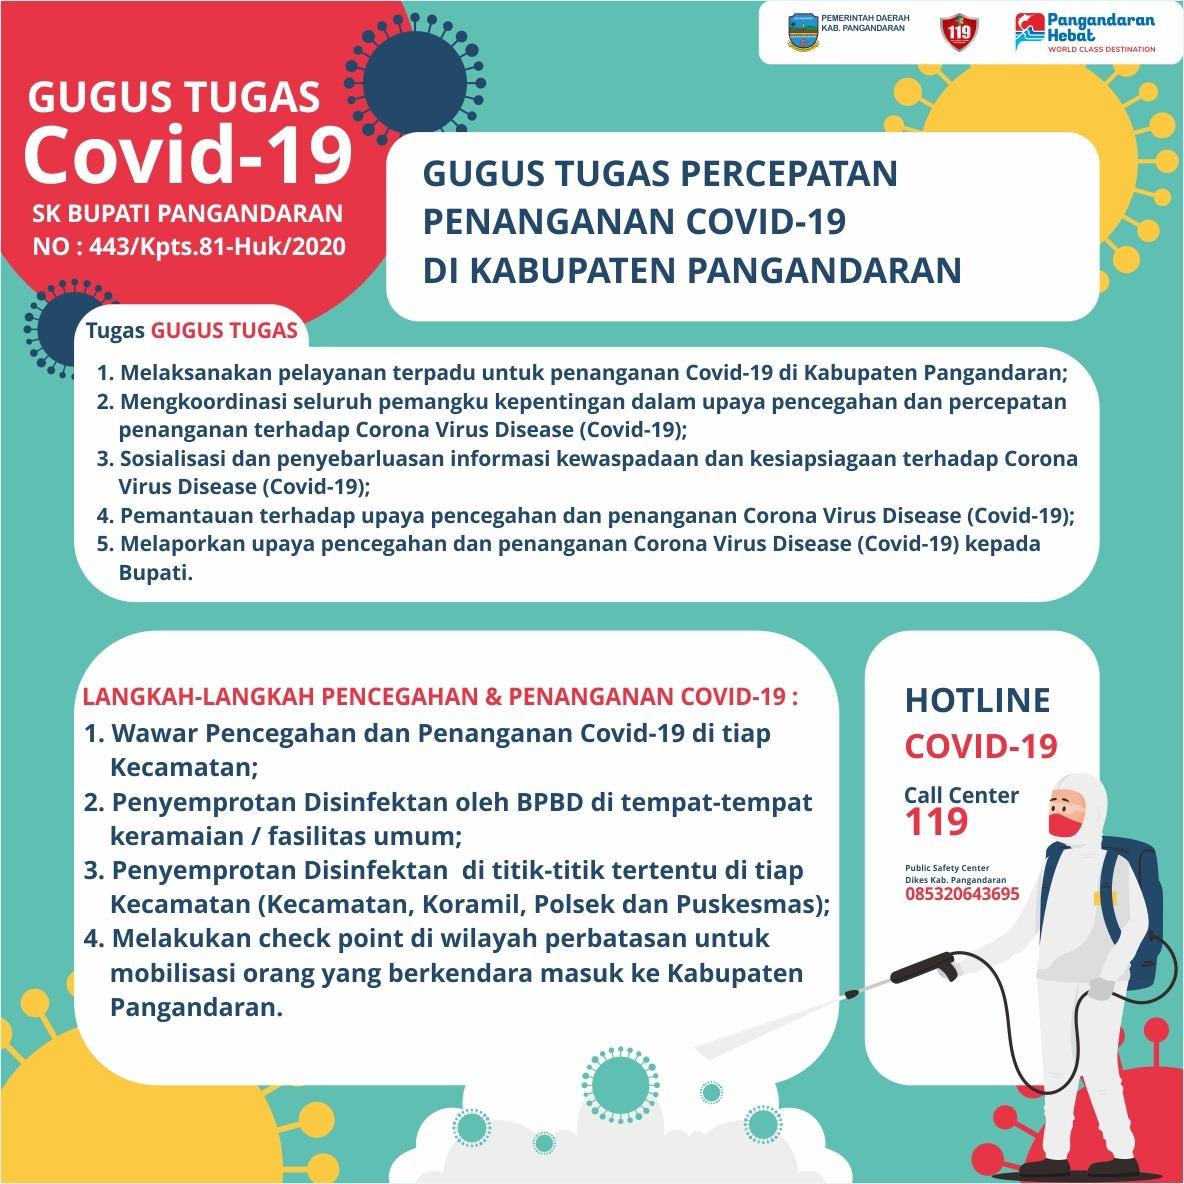 Gugus Tugas Covid-19 Kabupaten Pangandaran